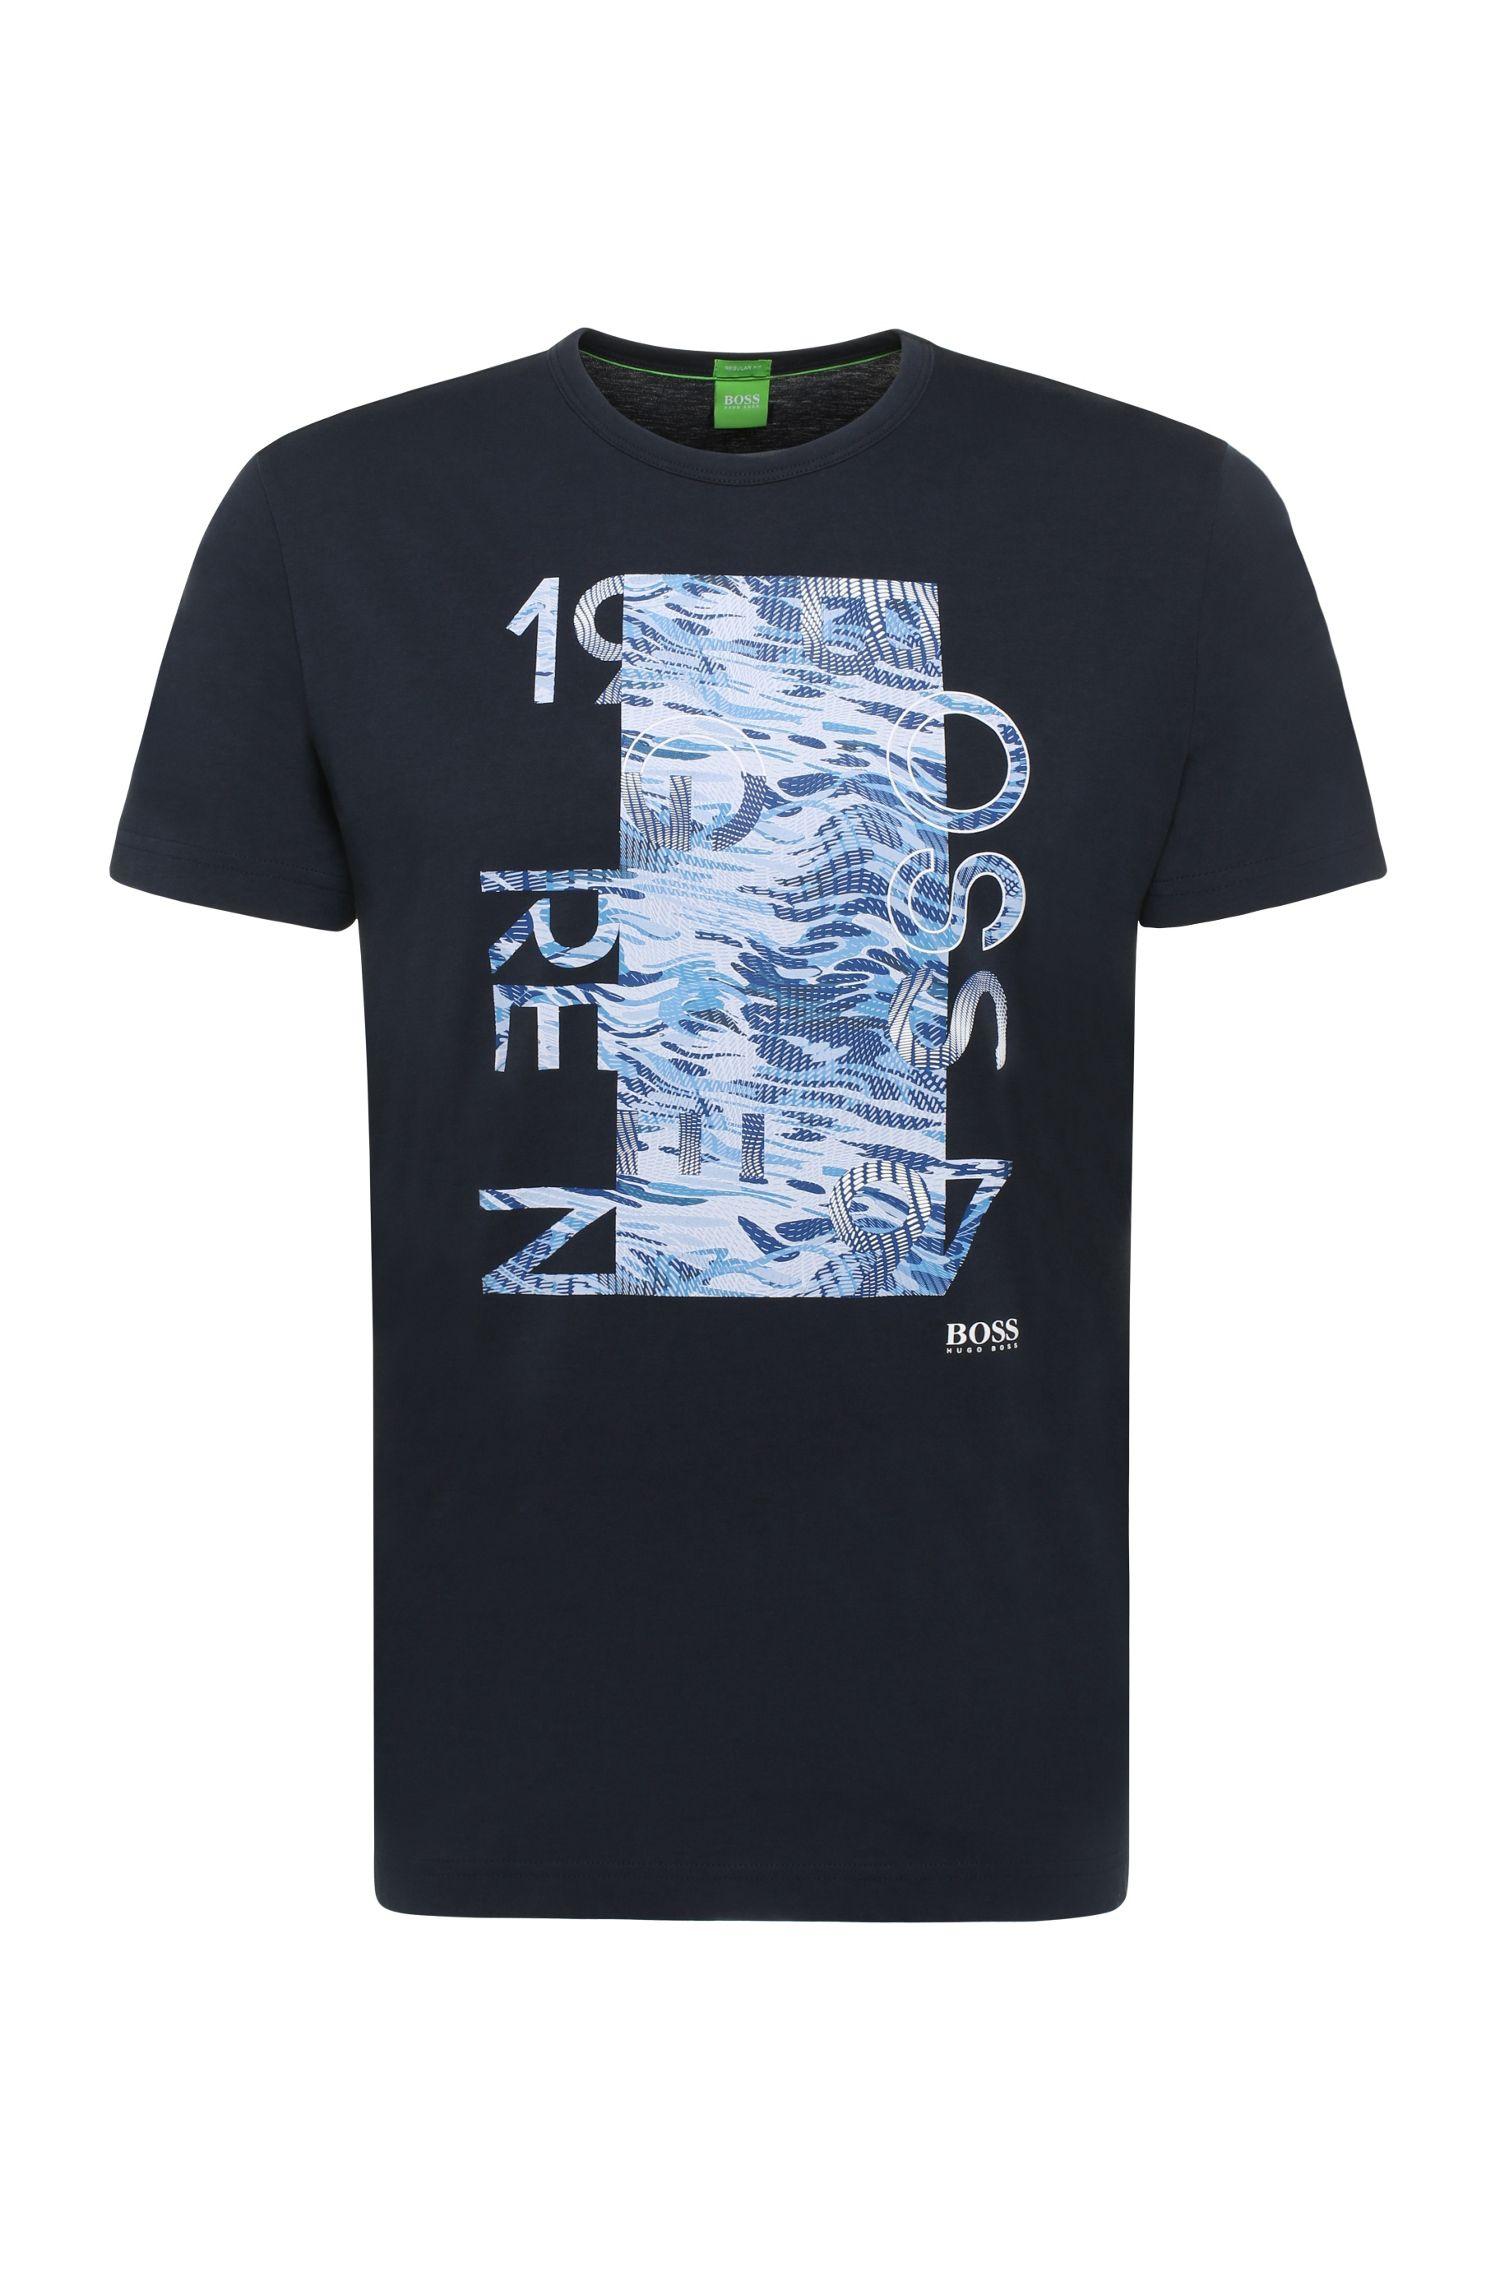 'Tee 4' | Cotton Graphic Print T-Shirt